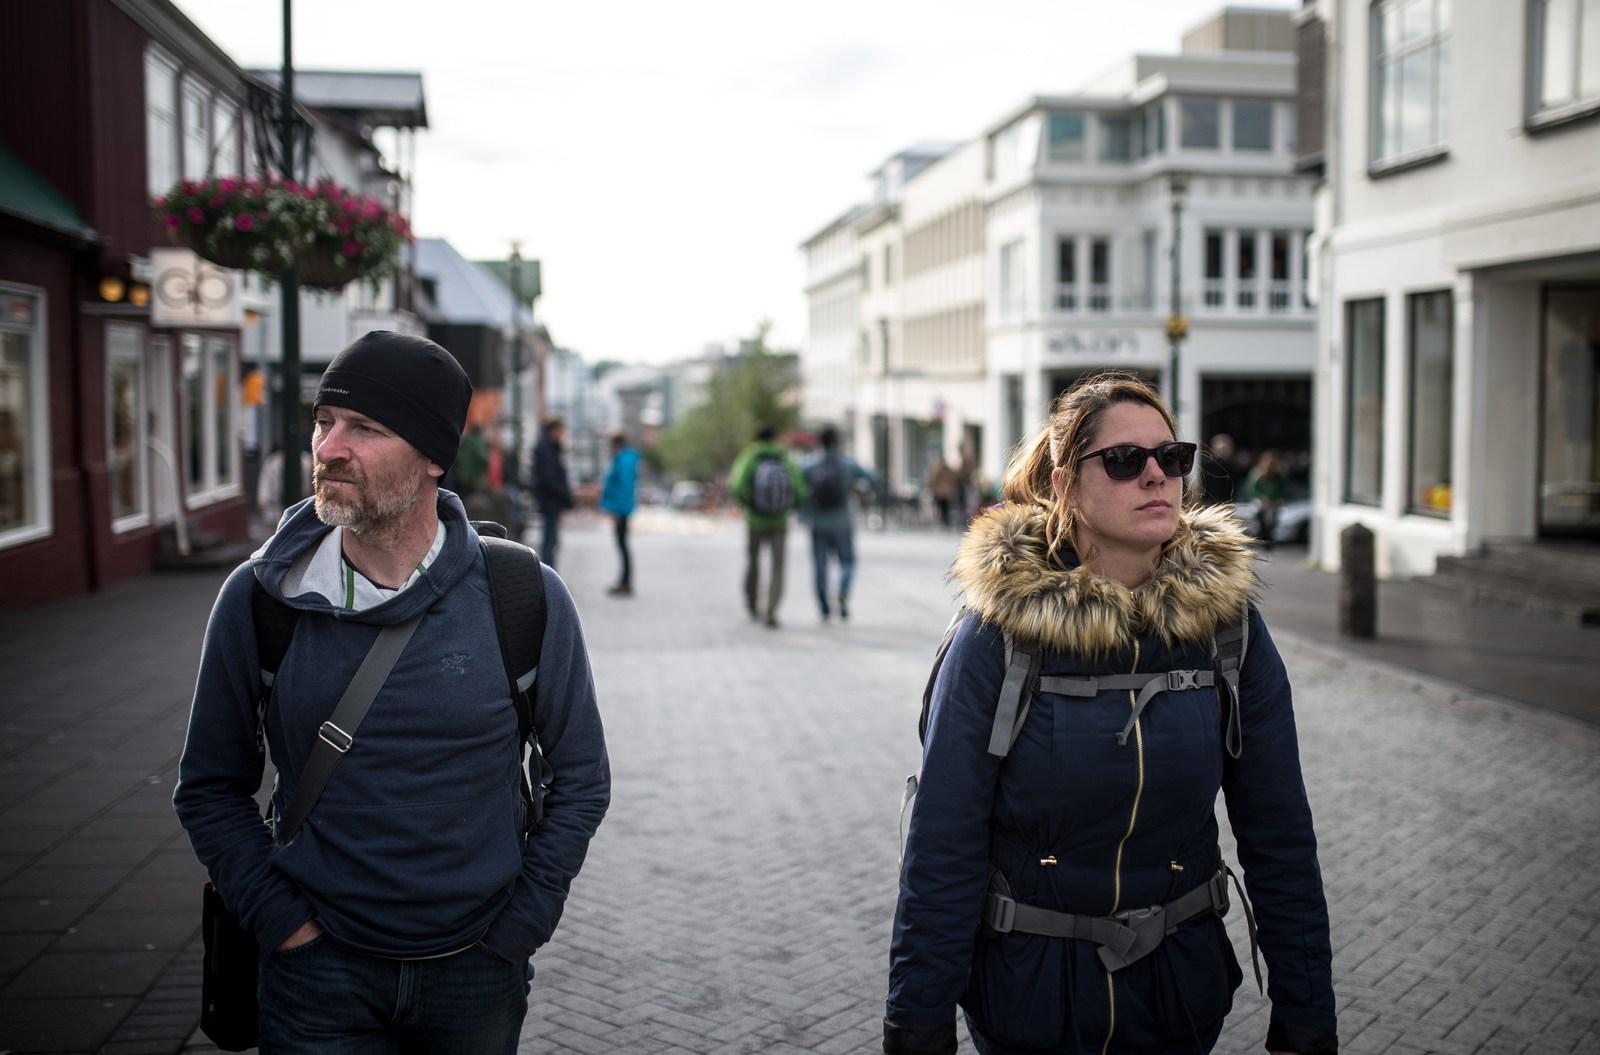 En balade dans Reykjavik  Reykjavik